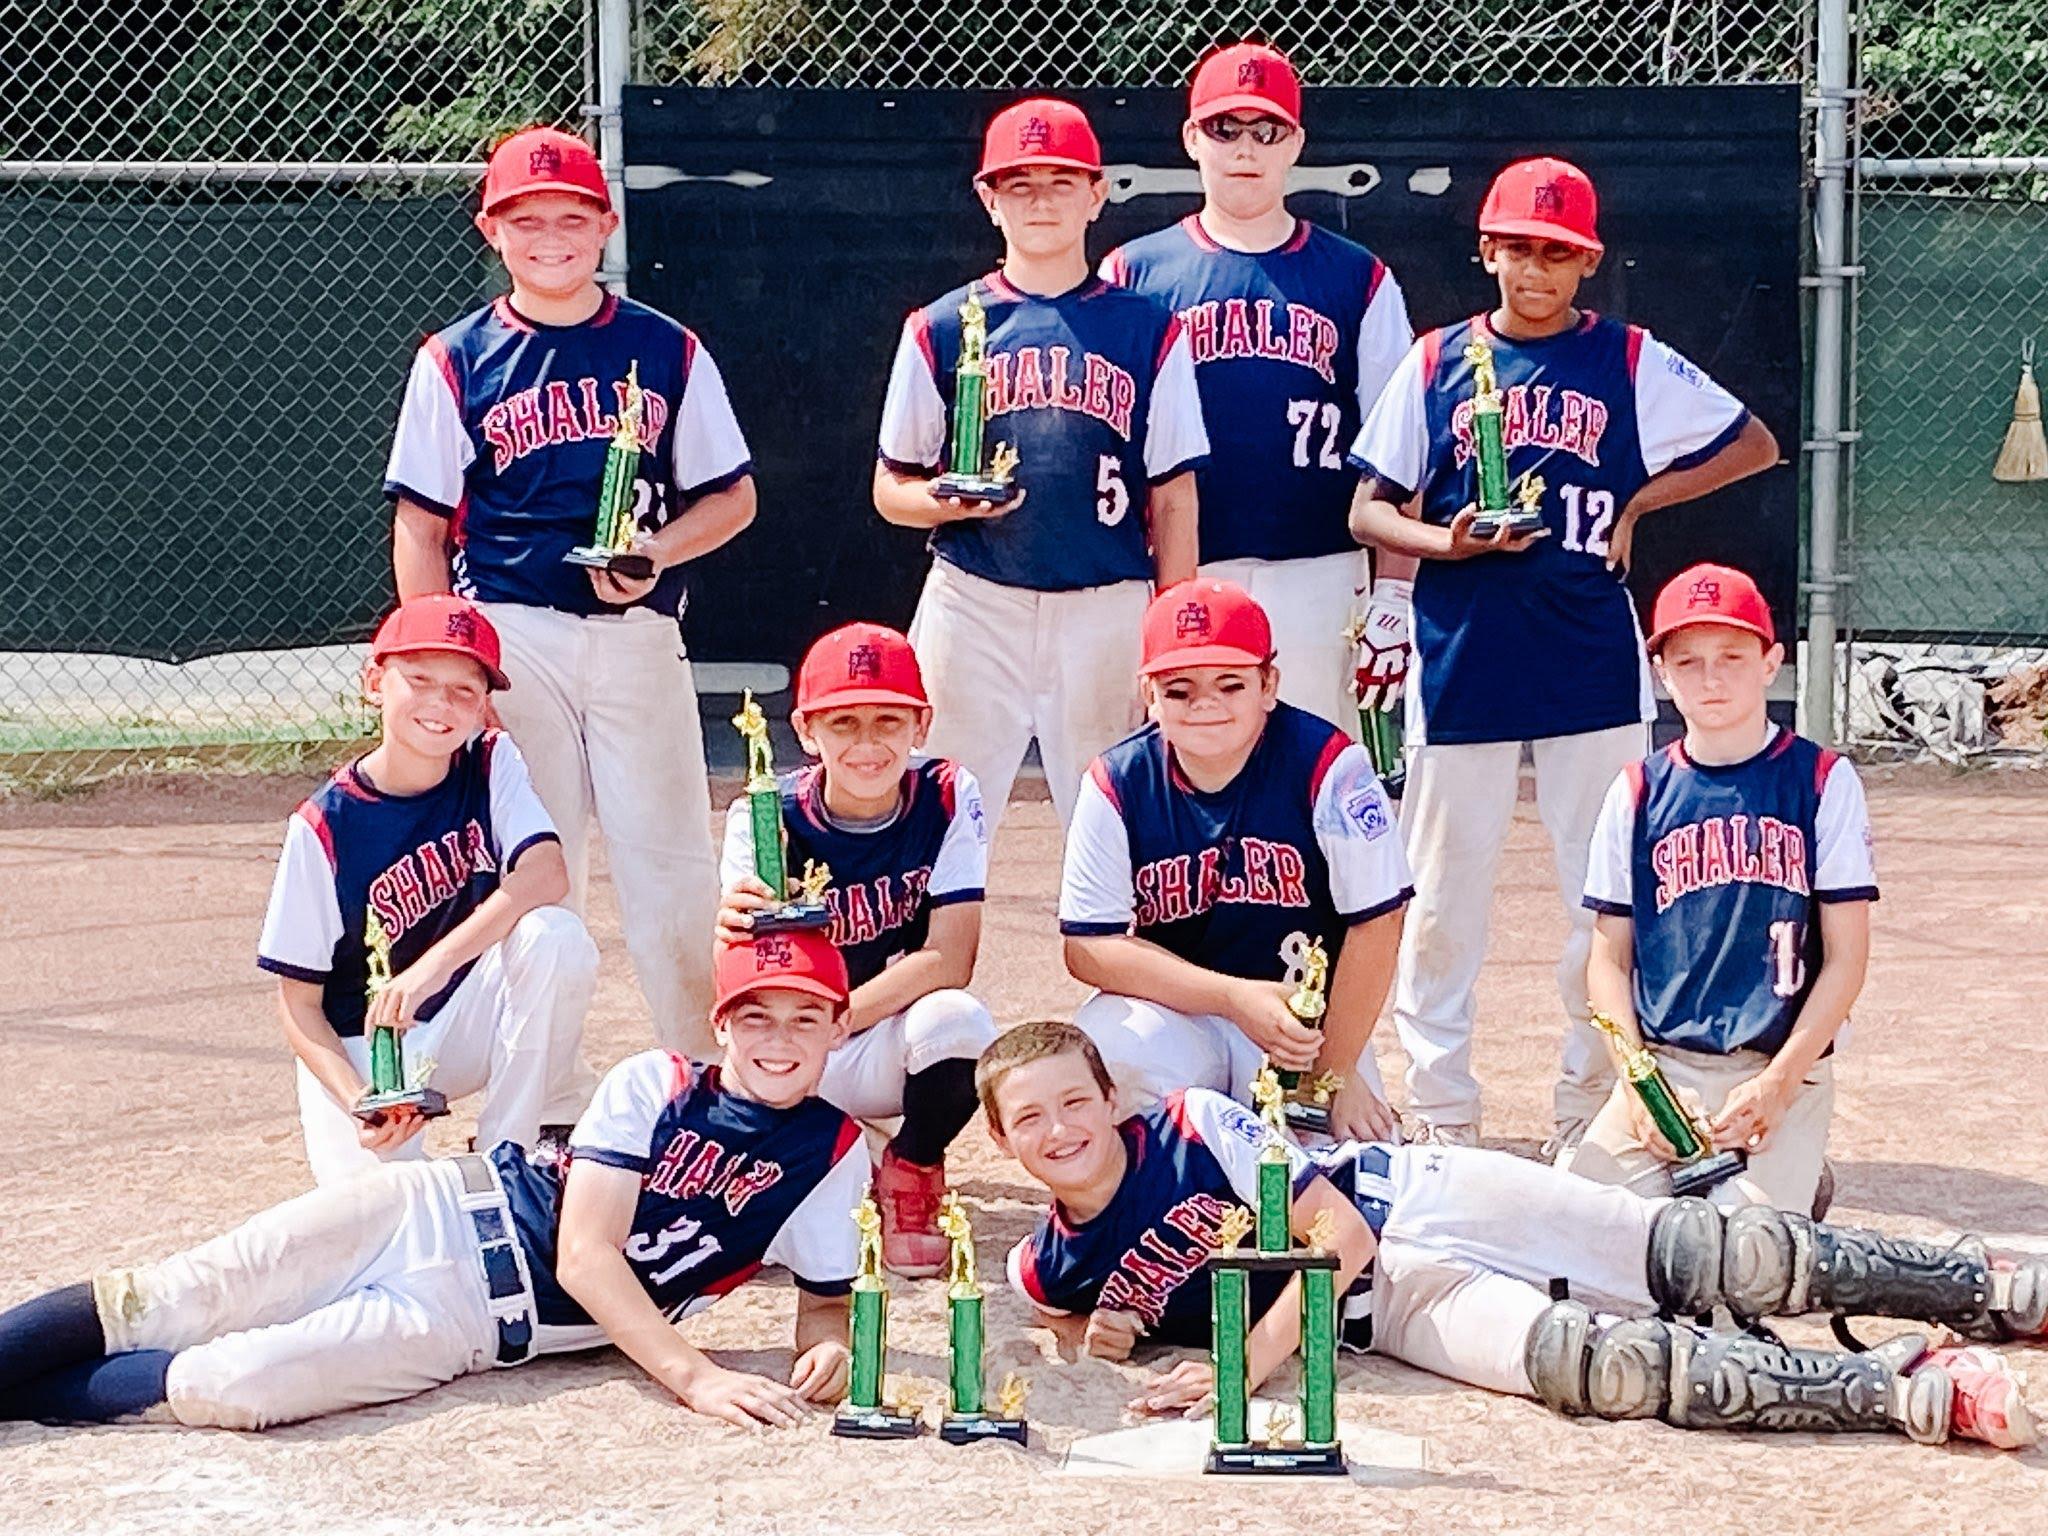 12U Team wins Riverside Tournament